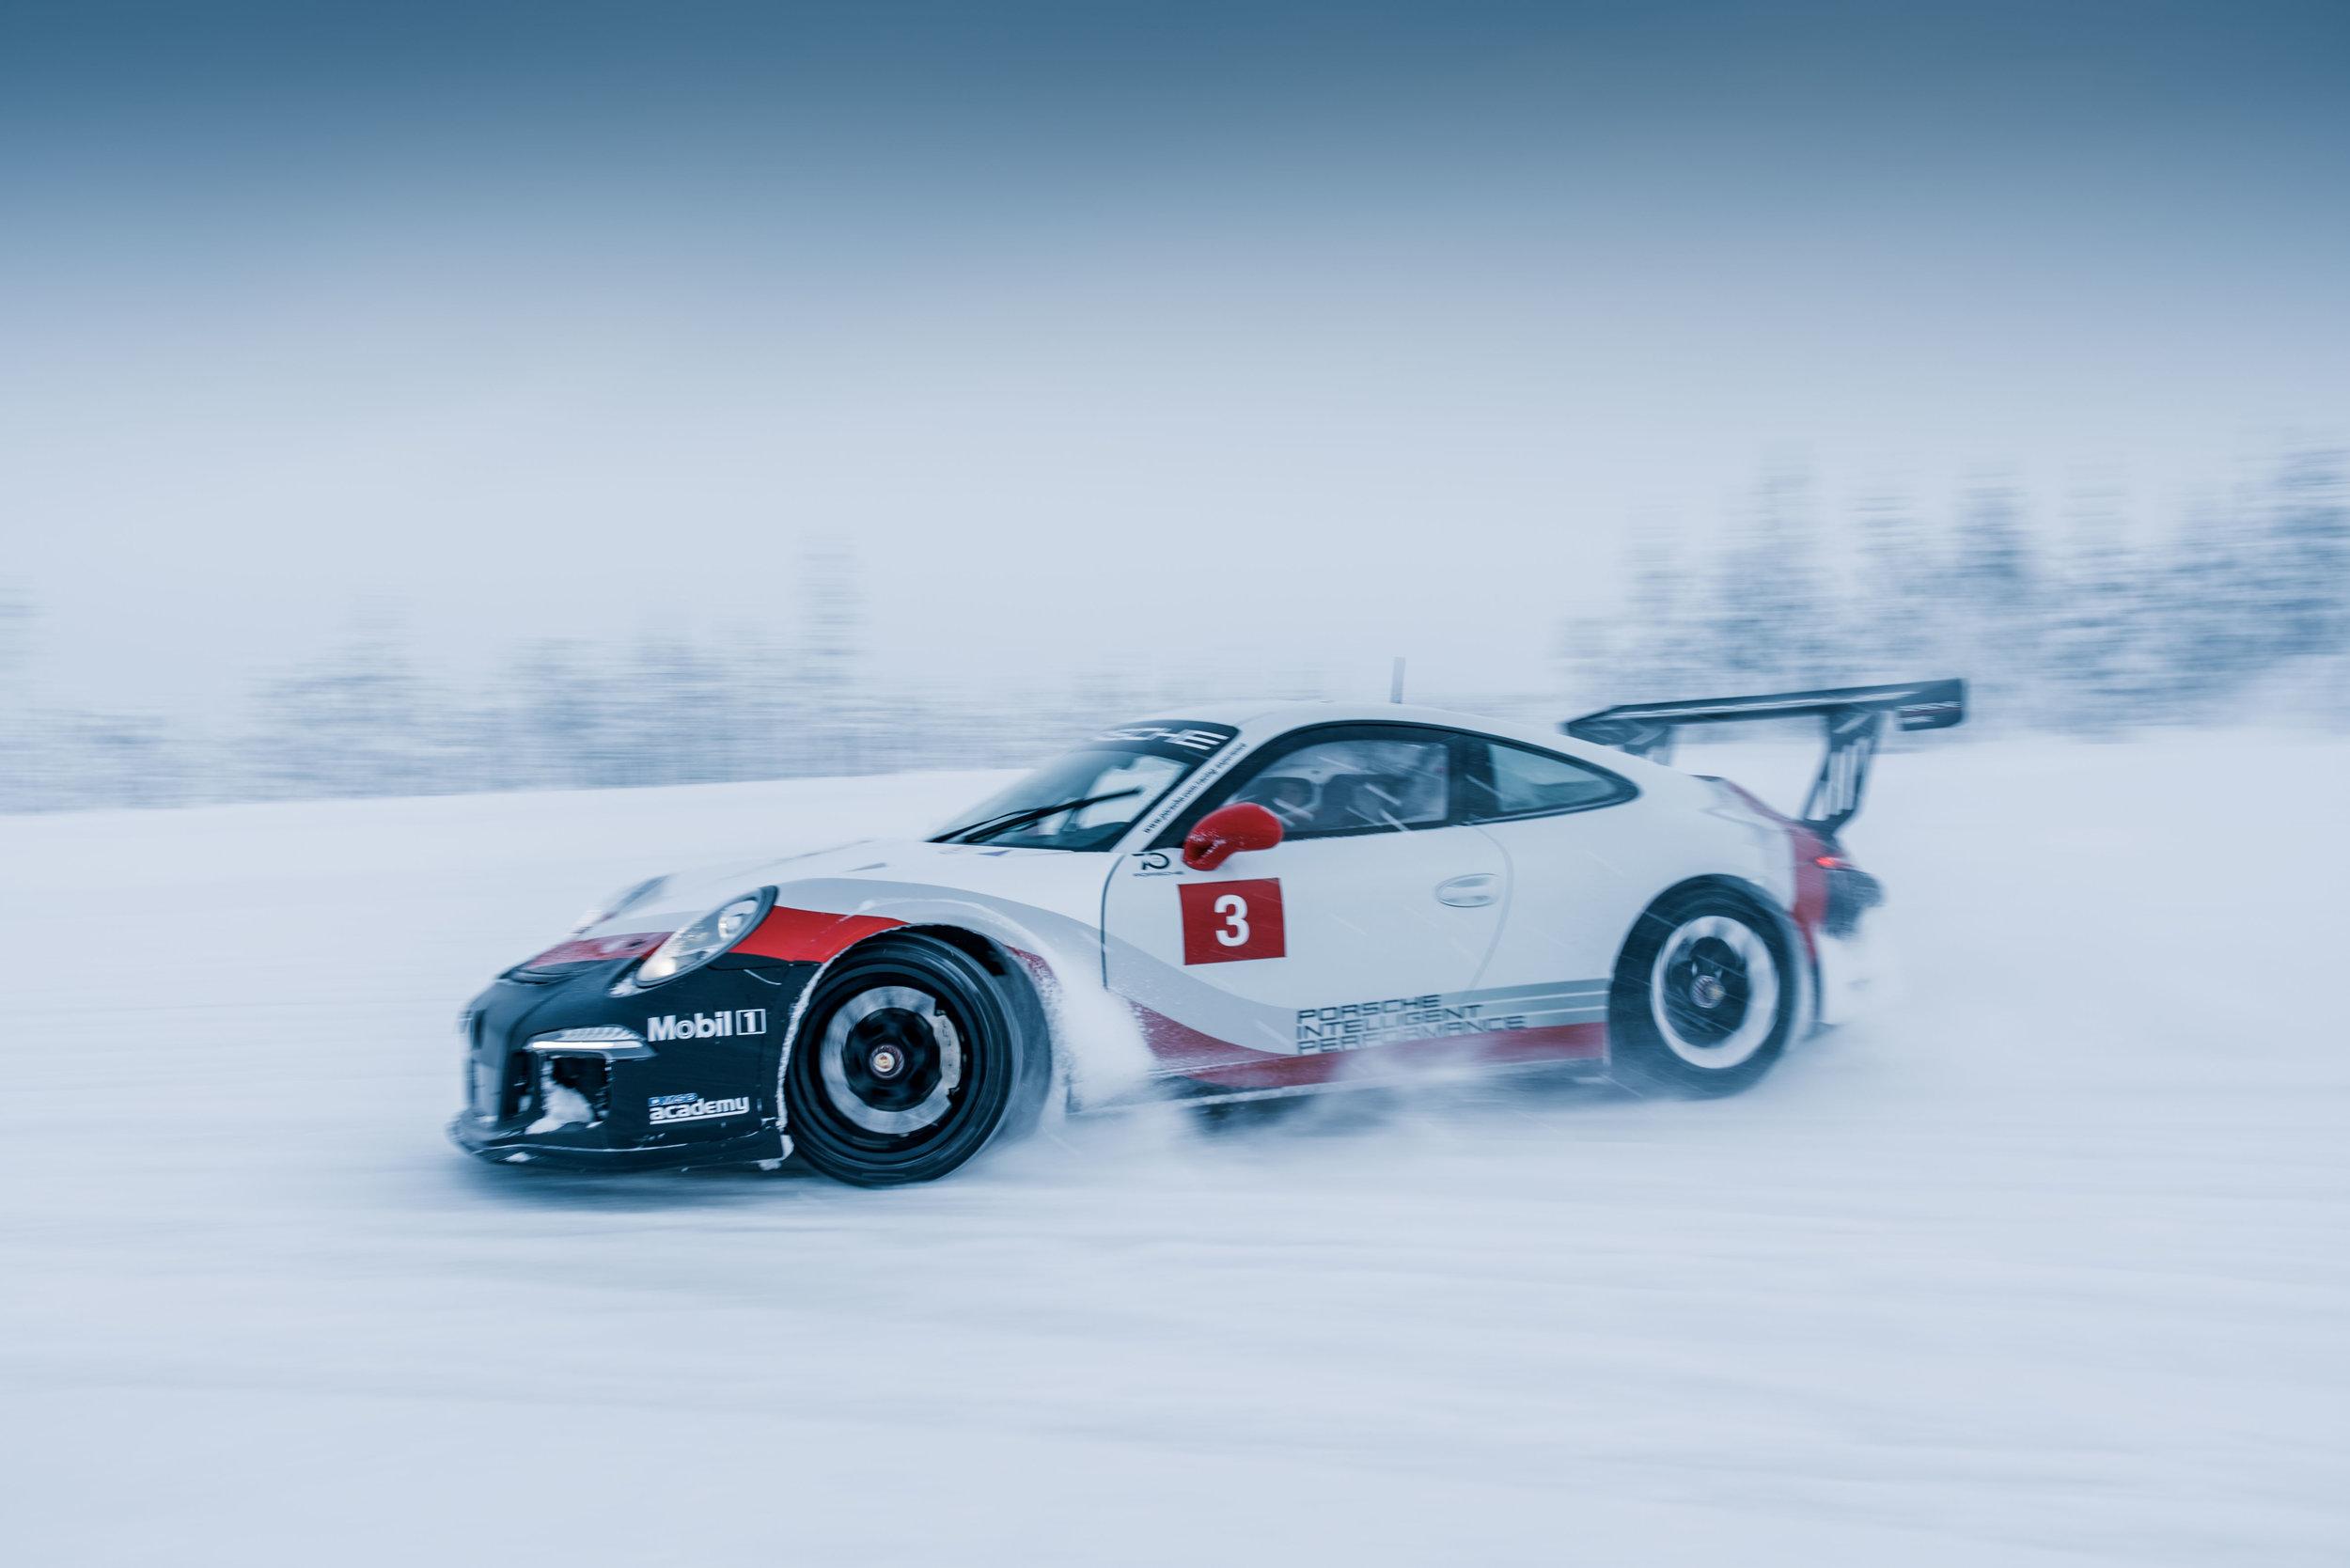 Porsche Ice Experience on Ice_30_01_2019_0478_175683.jpg